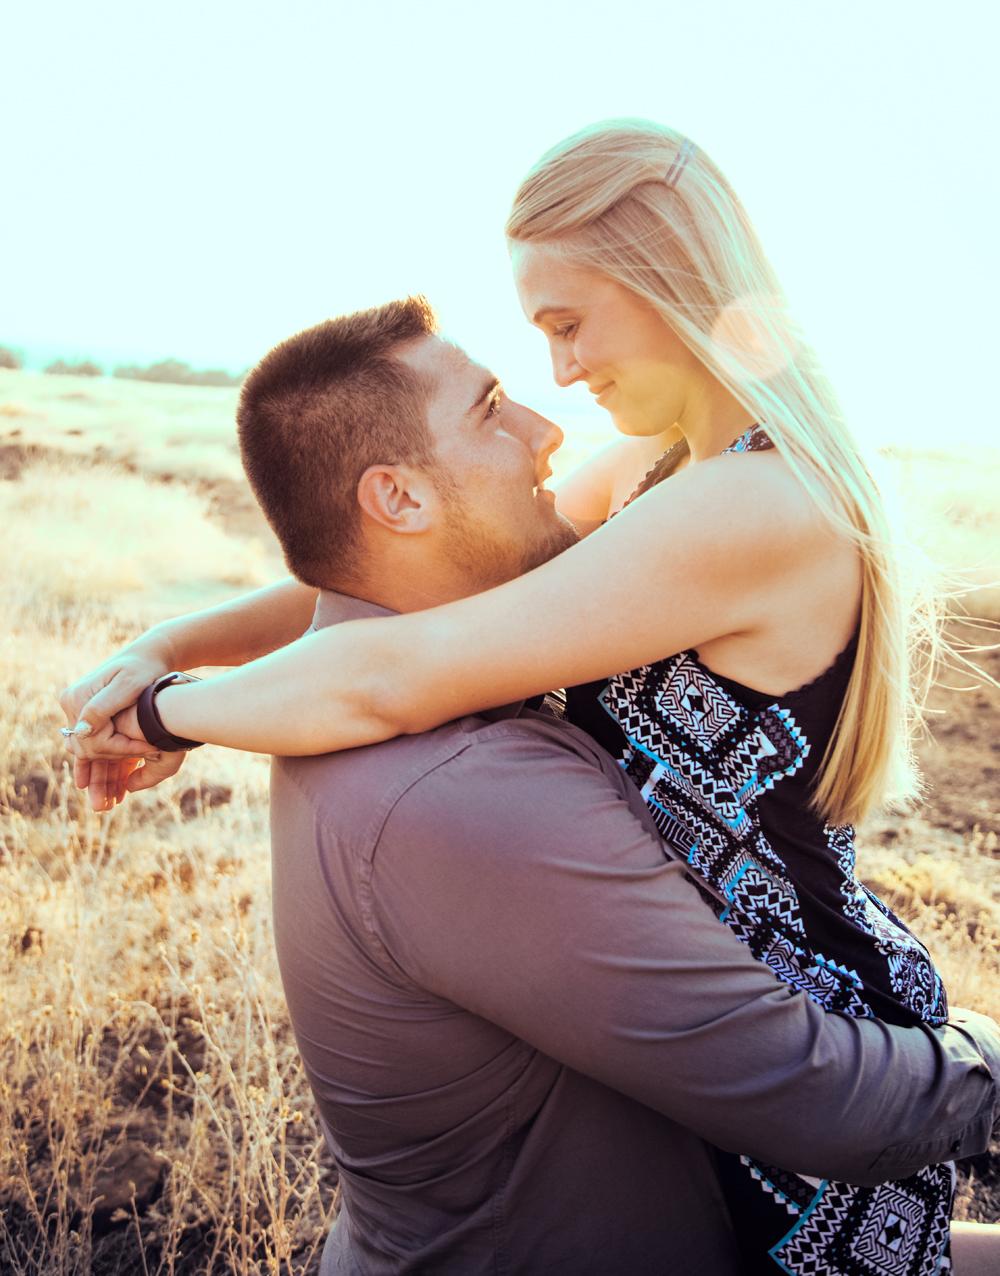 Couple-photoshoot-in-Chico-Upper-Bidwell-Park-12.jpg